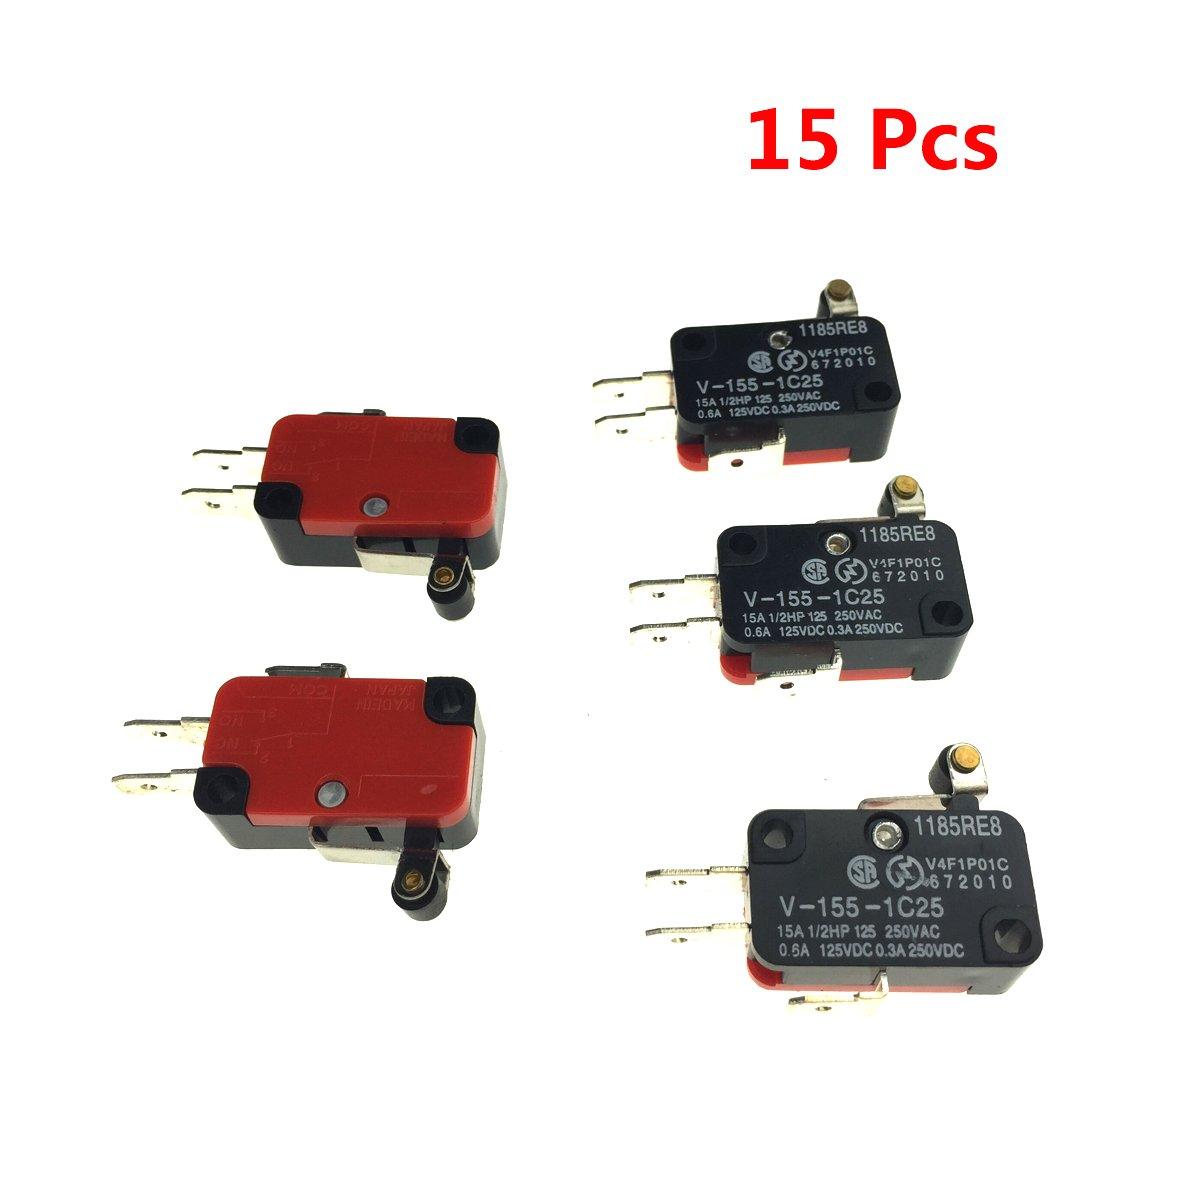 Chips /& Arrays WE-CBF Bead 100MHz 22ohm 1000mA EMI Filter Beads 100 pieces